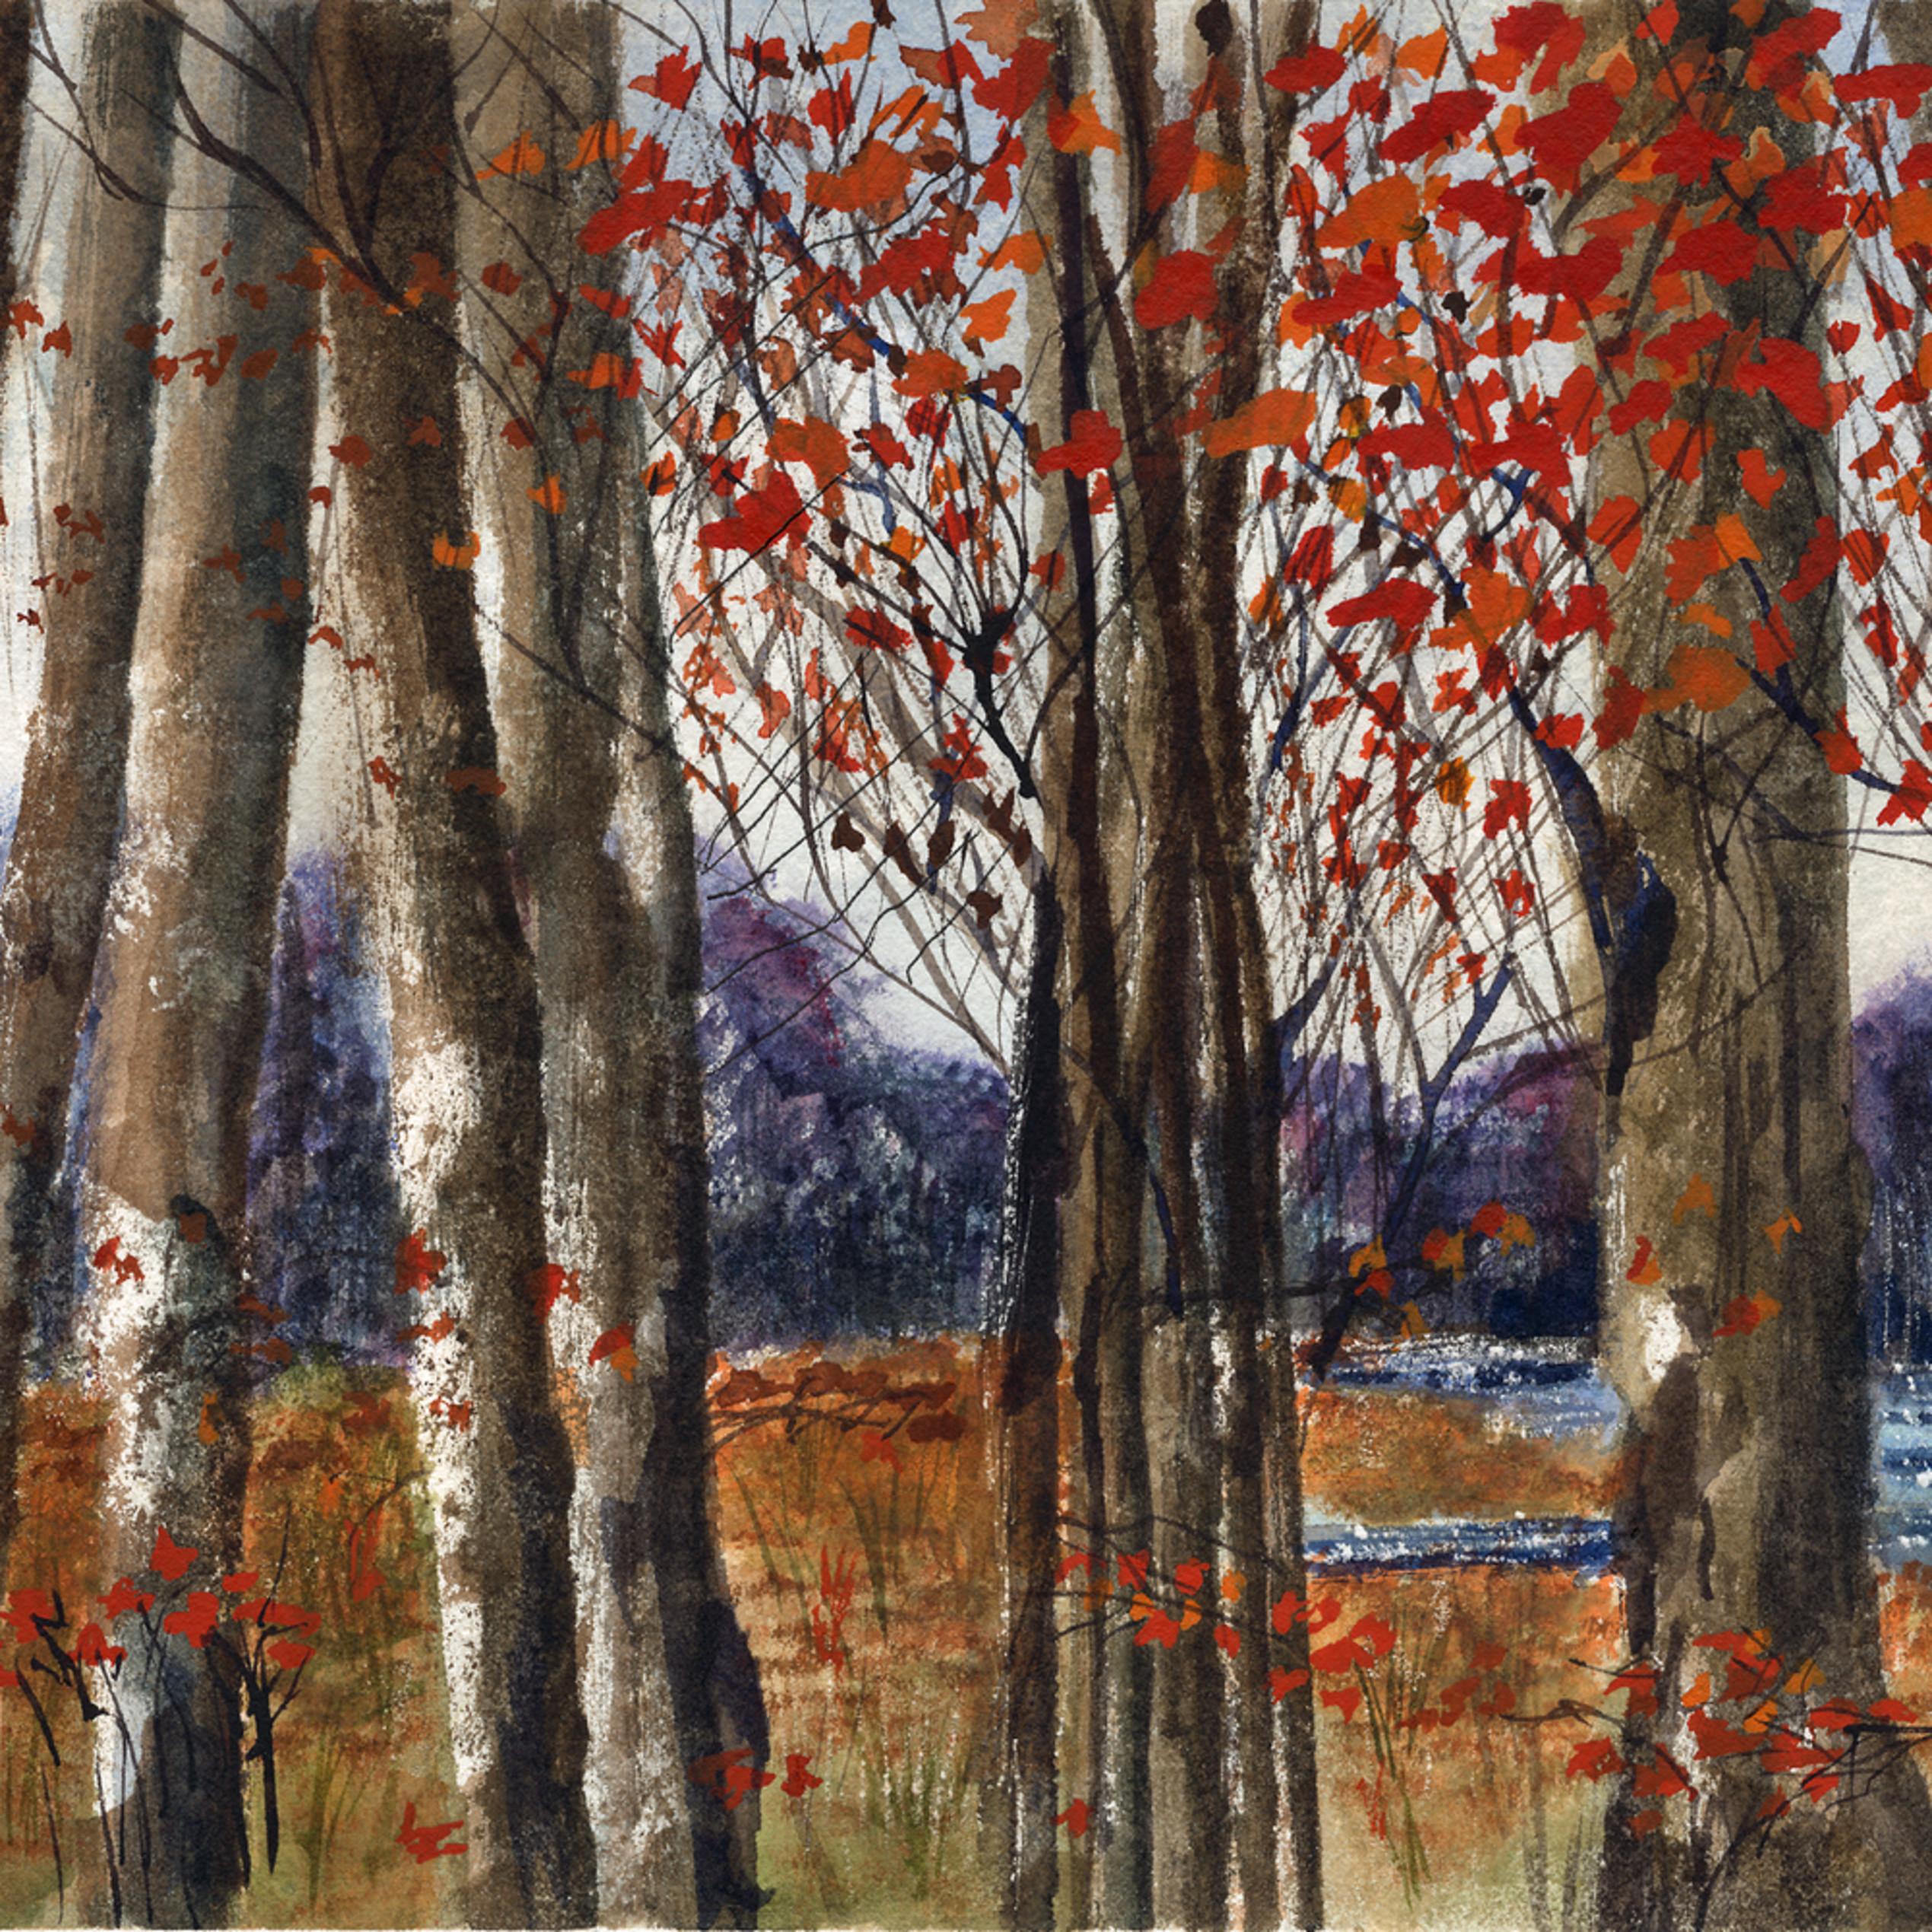 Autumn   halton hills   watercolour on panel   8.5 22 x 18.5 22 jt6jgd